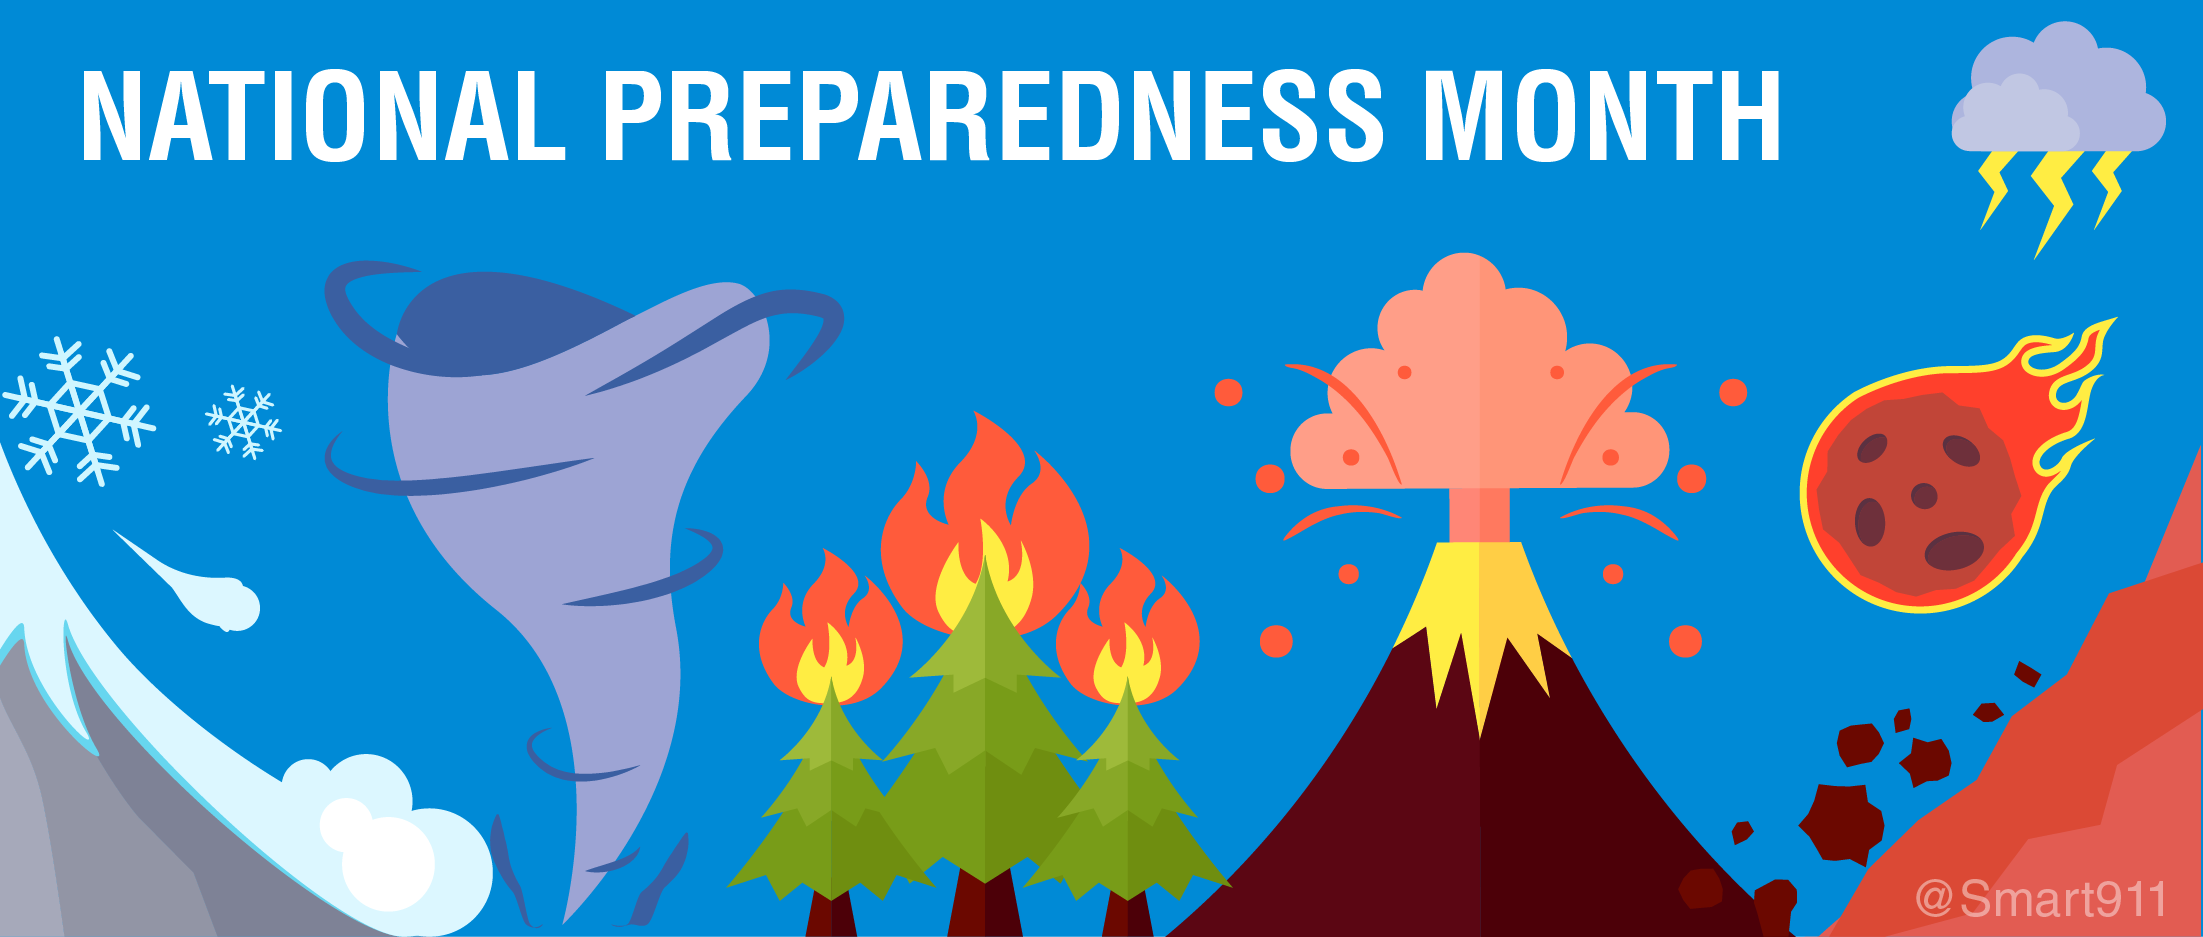 Preparedness Month Banner-02